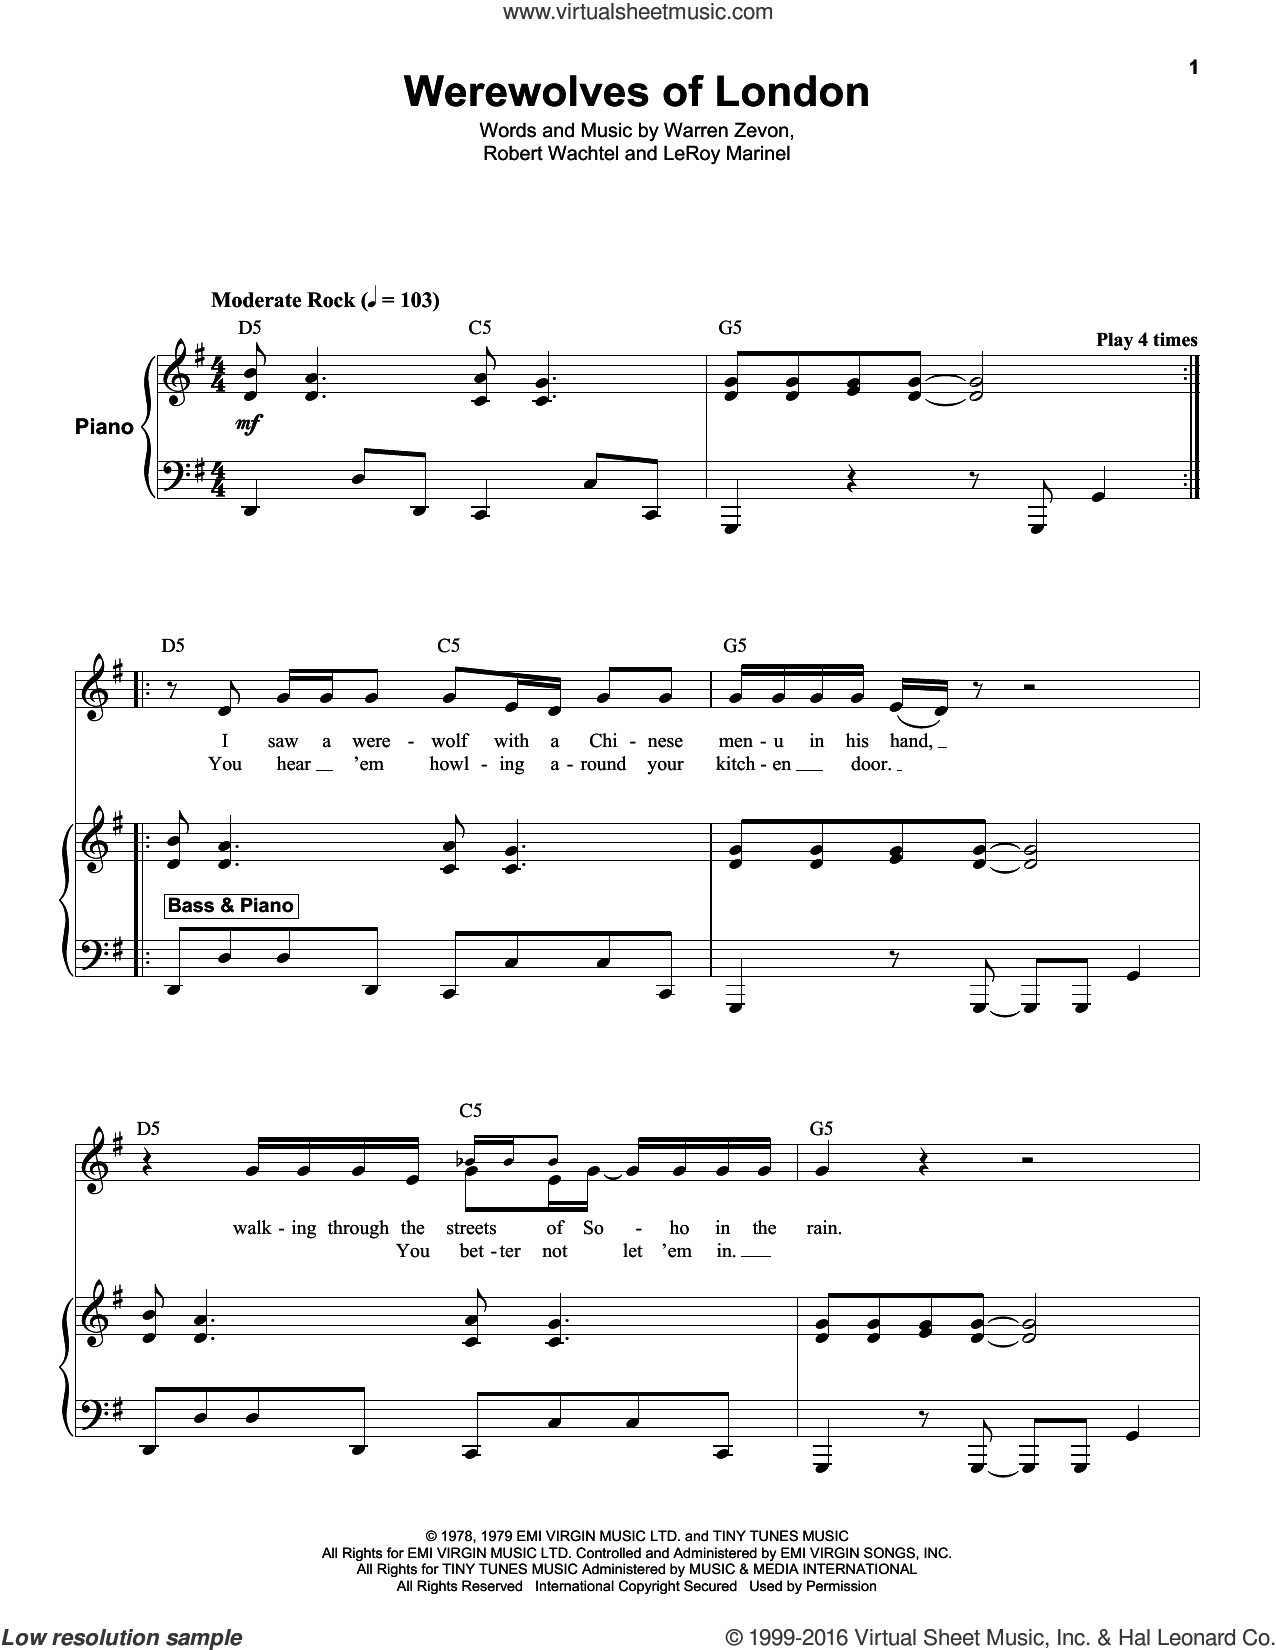 Werewolves Of London sheet music for keyboard or piano by Warren Zevon, Leroy Marinell and Waddy Wachtel, intermediate skill level